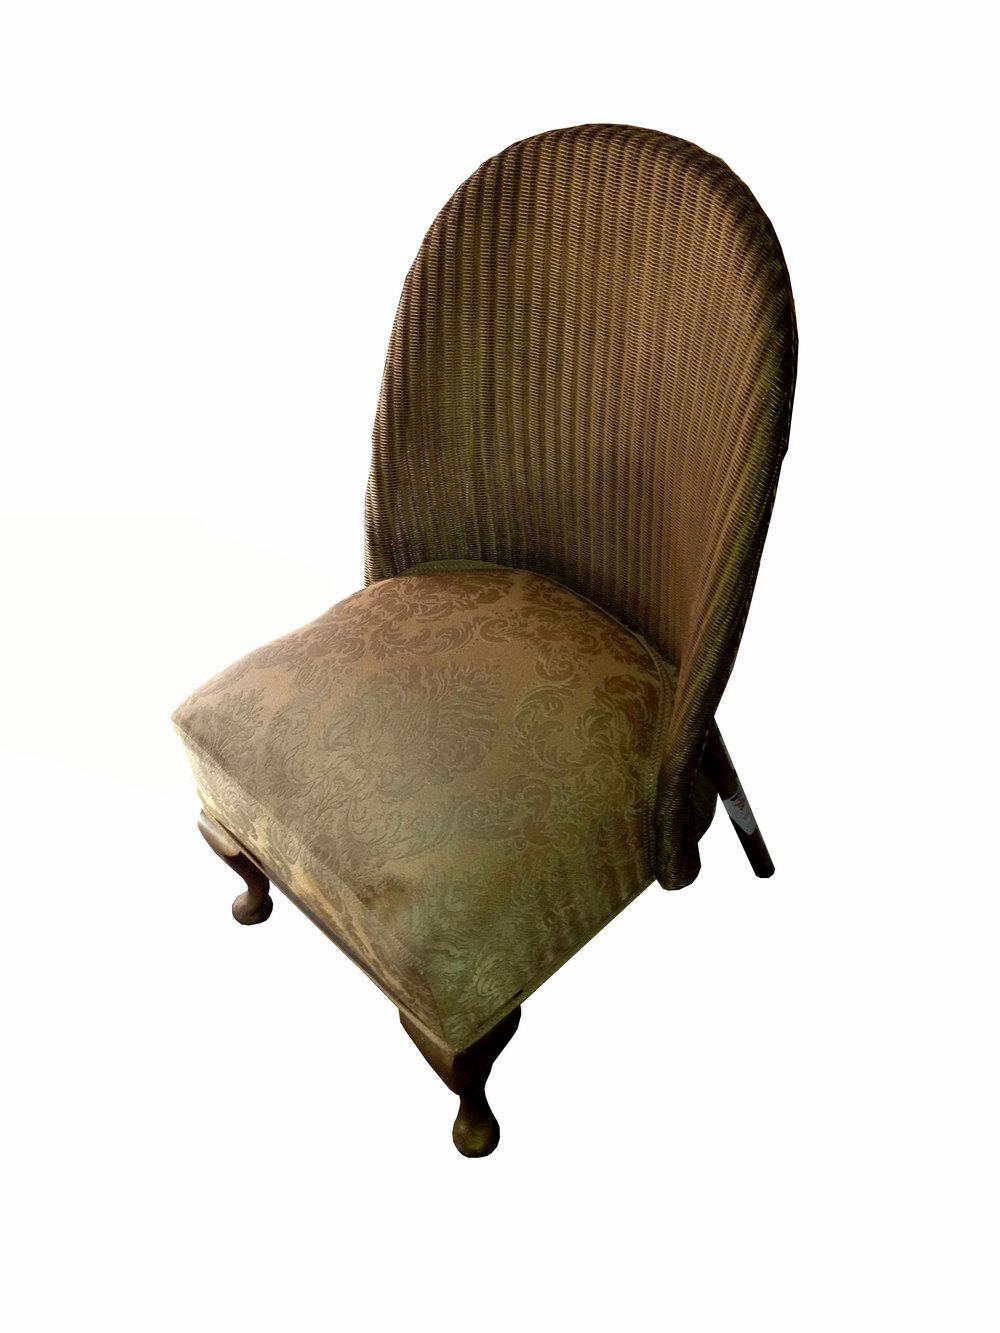 lloyd loom chair antiques atlas. Black Bedroom Furniture Sets. Home Design Ideas